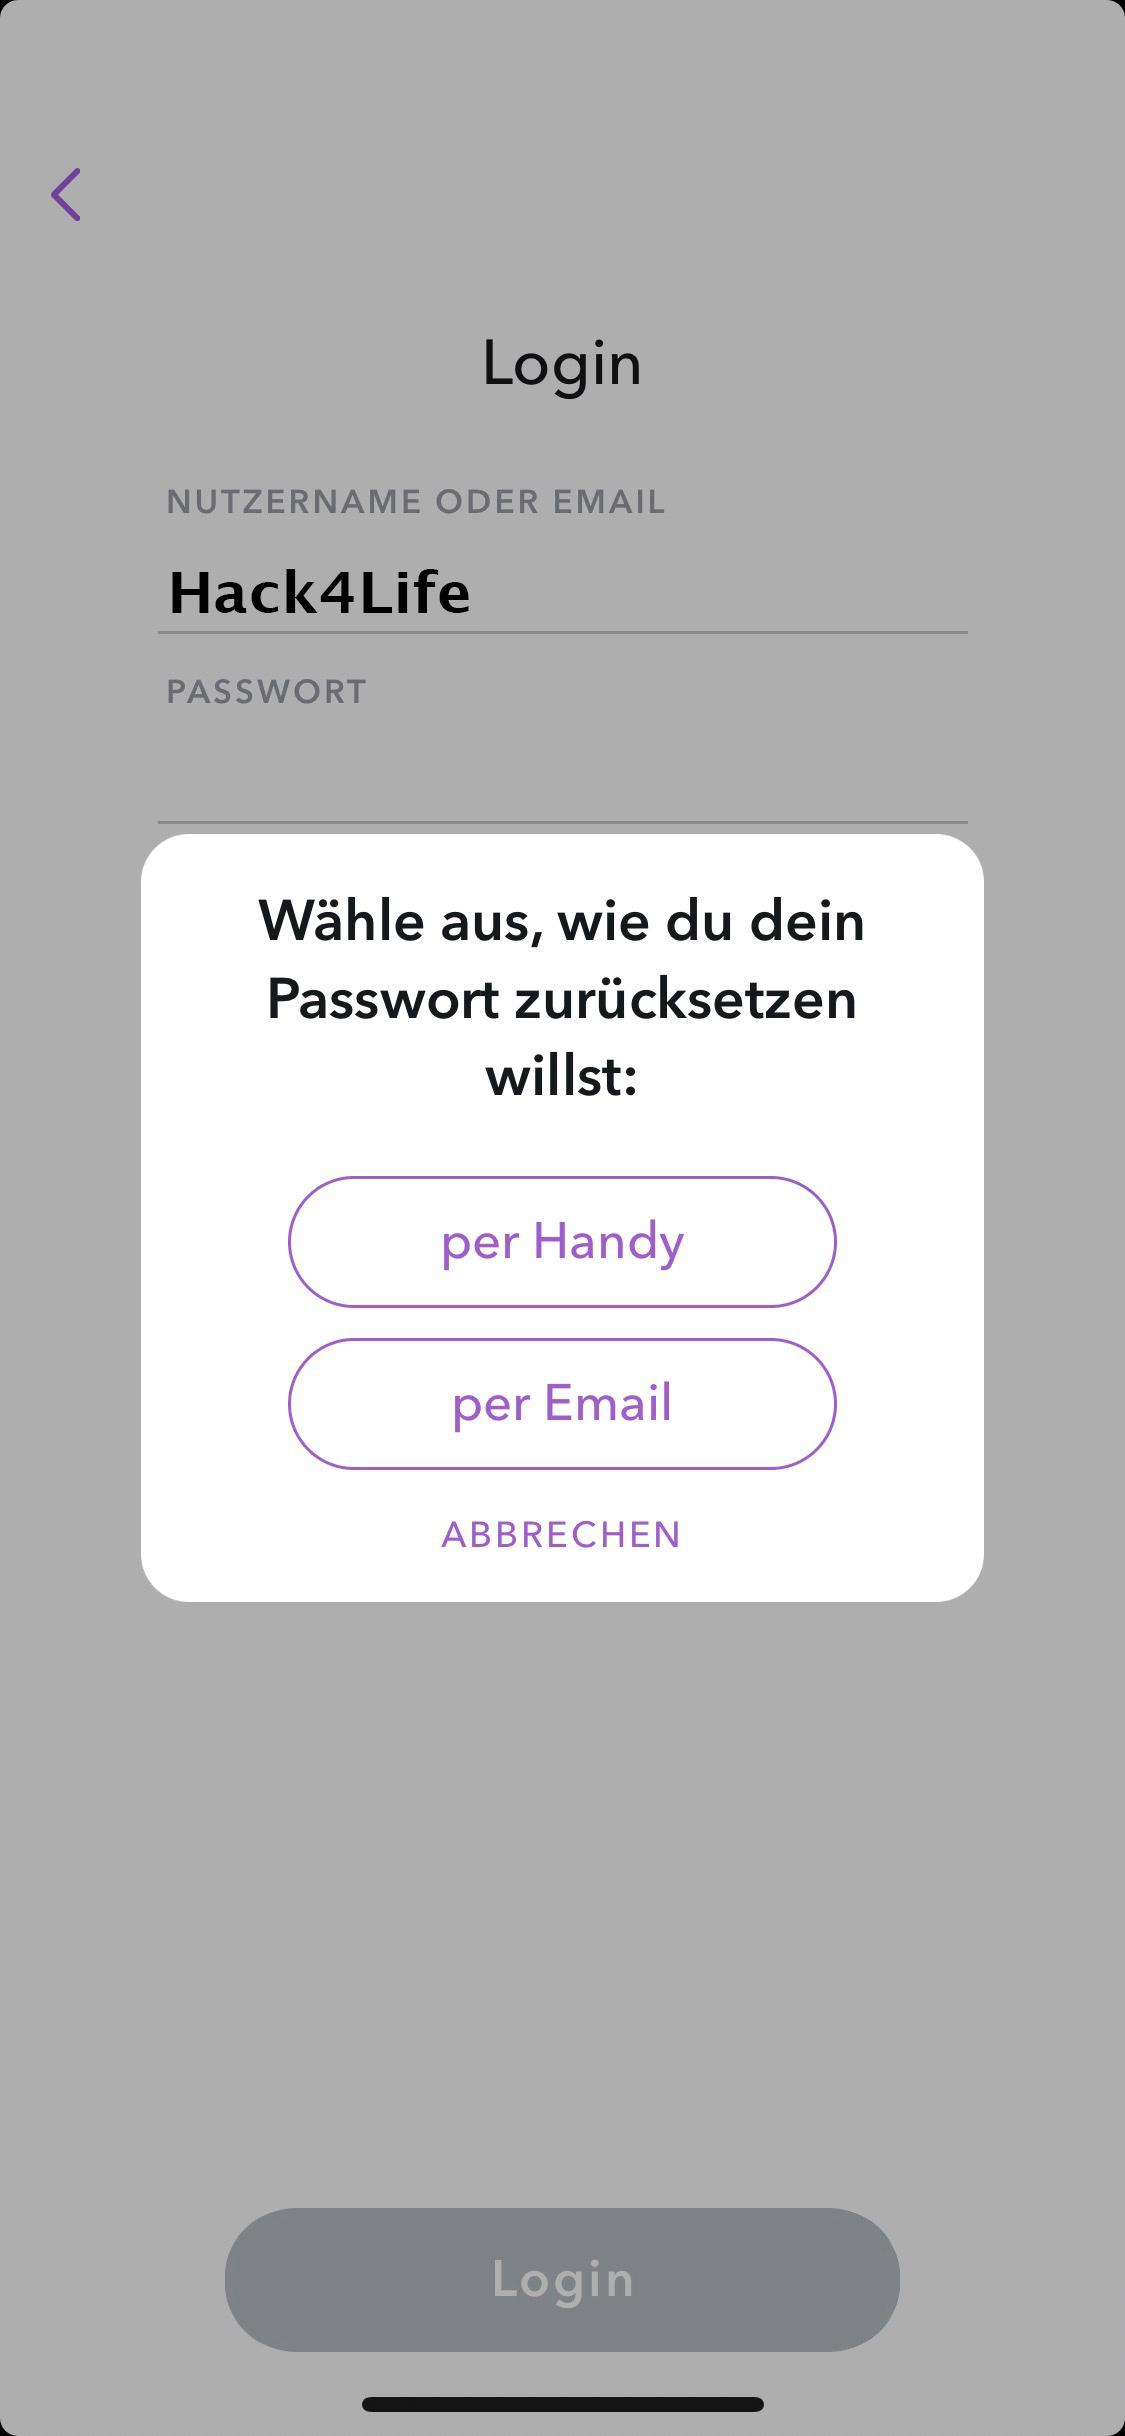 Passwort per Handy zurücksetzen, Hack4Life, Snapchat